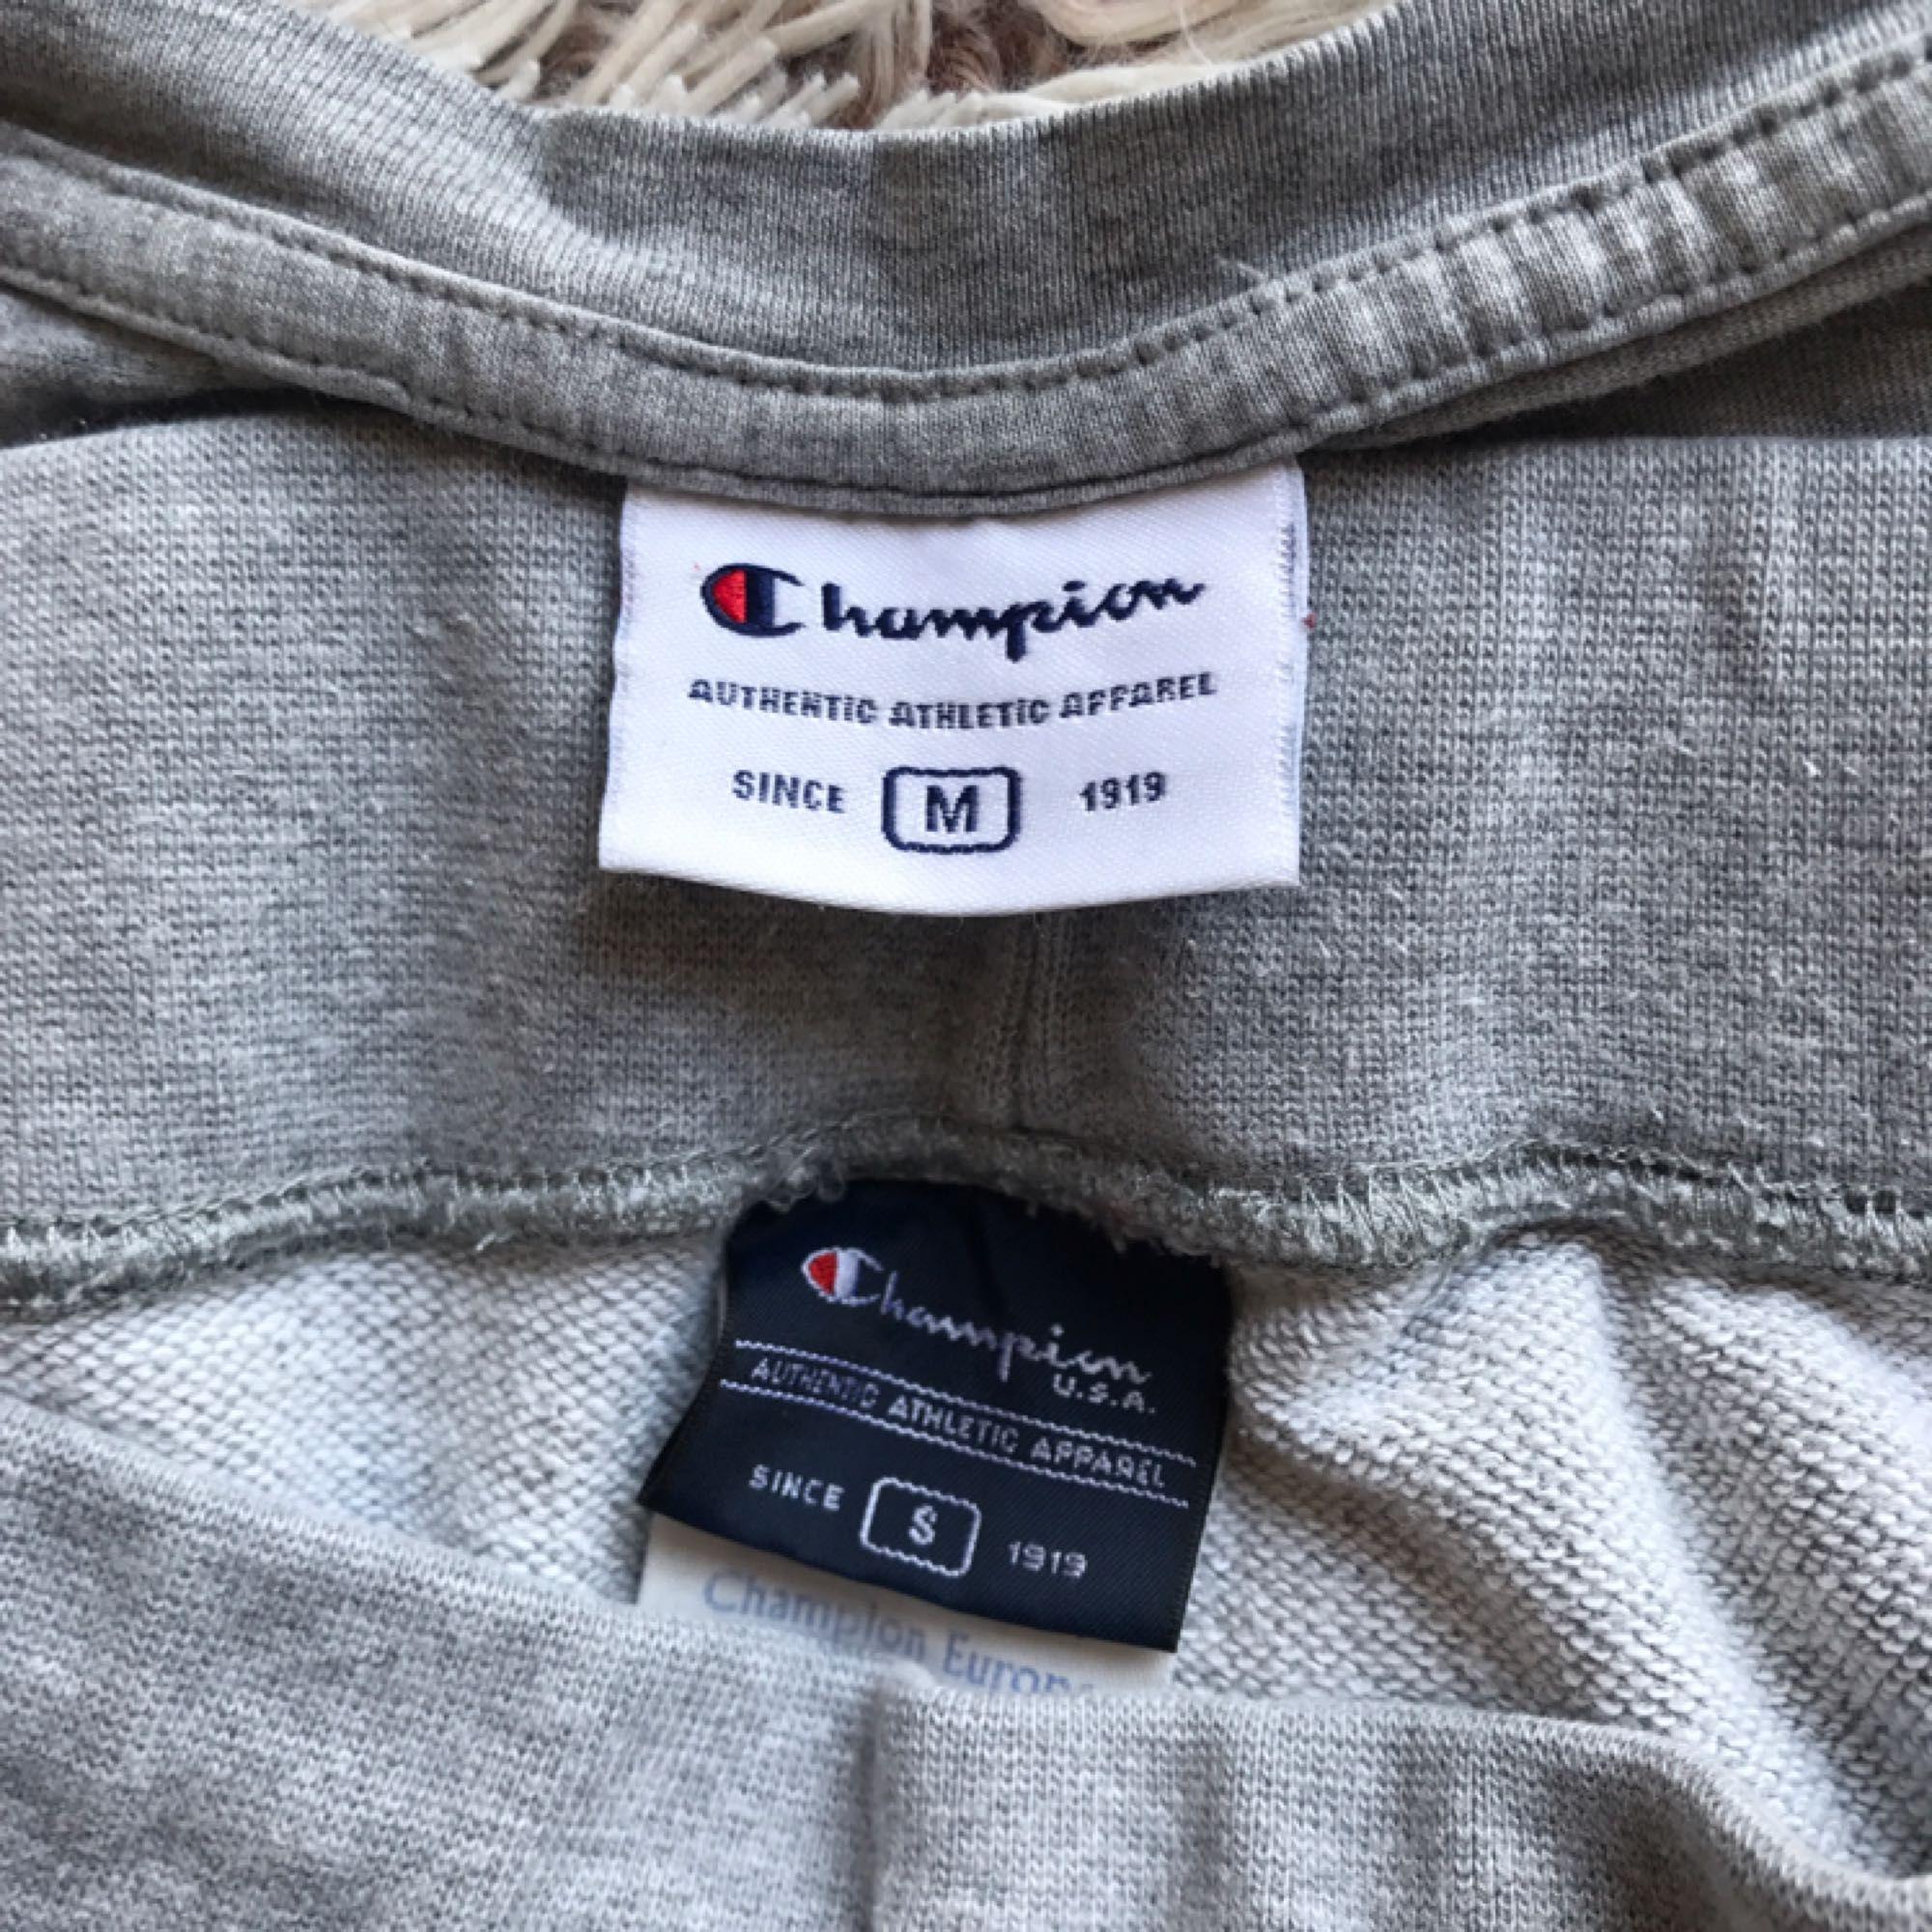 Champion T-shirt/shorts set. Passar storlek 38/S/M. Frakt ingår i priset💛 (shortsen sålda. Priset gäller tröjan). T-shirts.